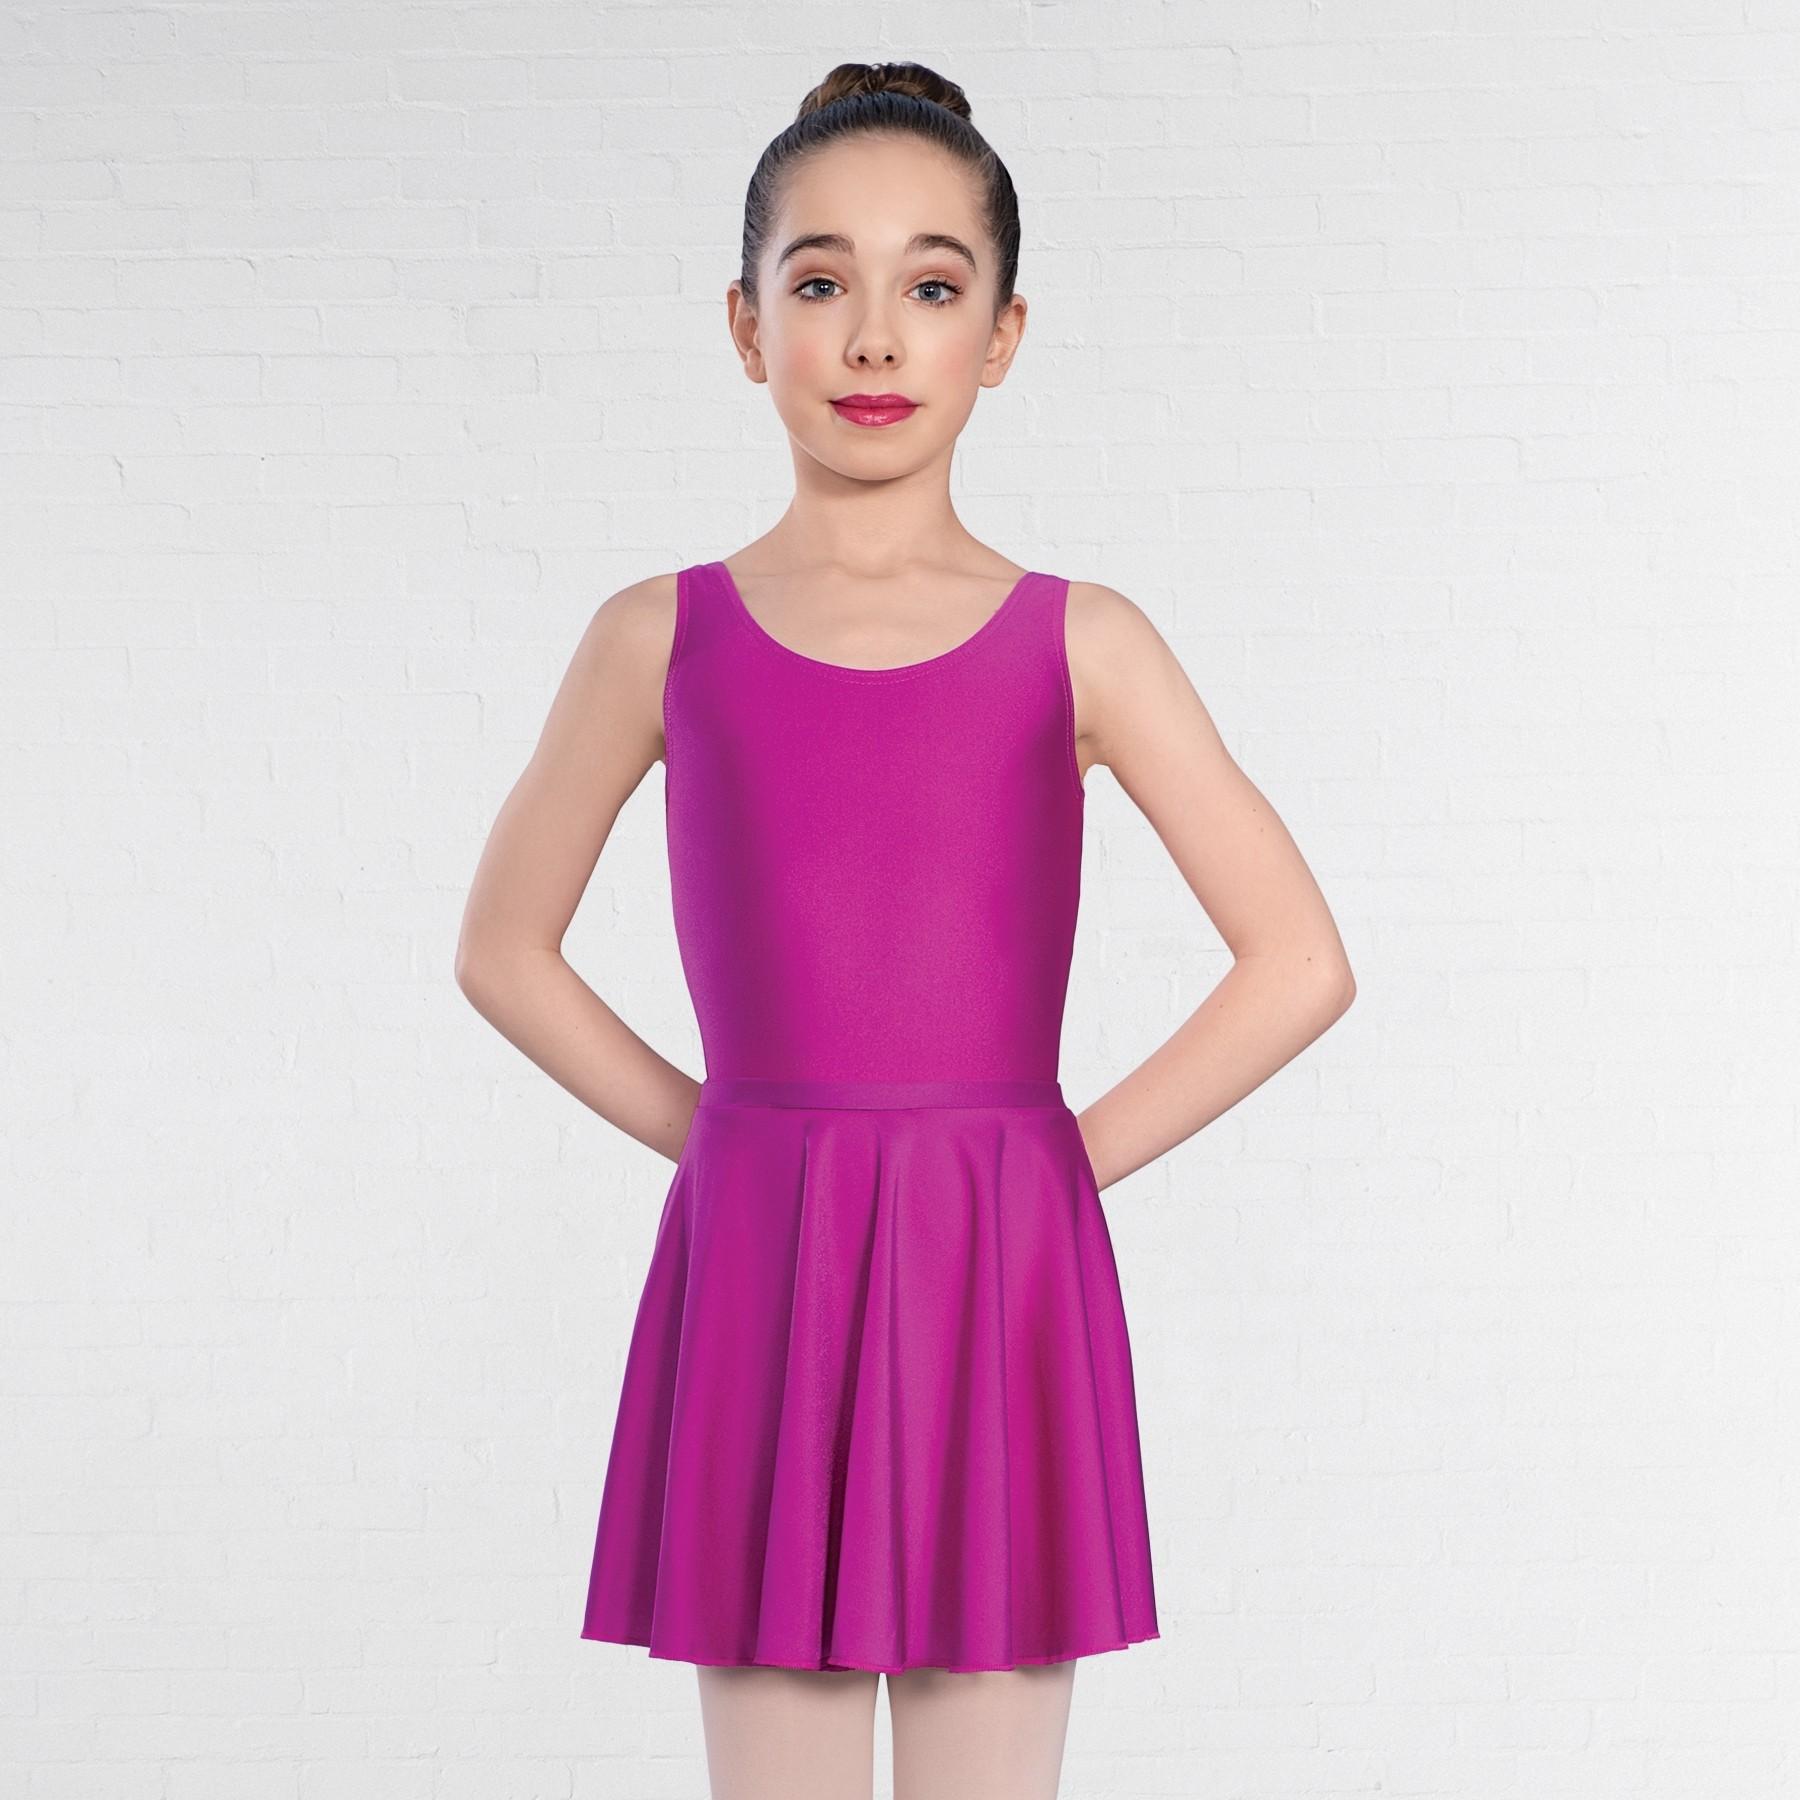 978c28676969 1st Position Value Sleeveless Leotard (Bright Pink)